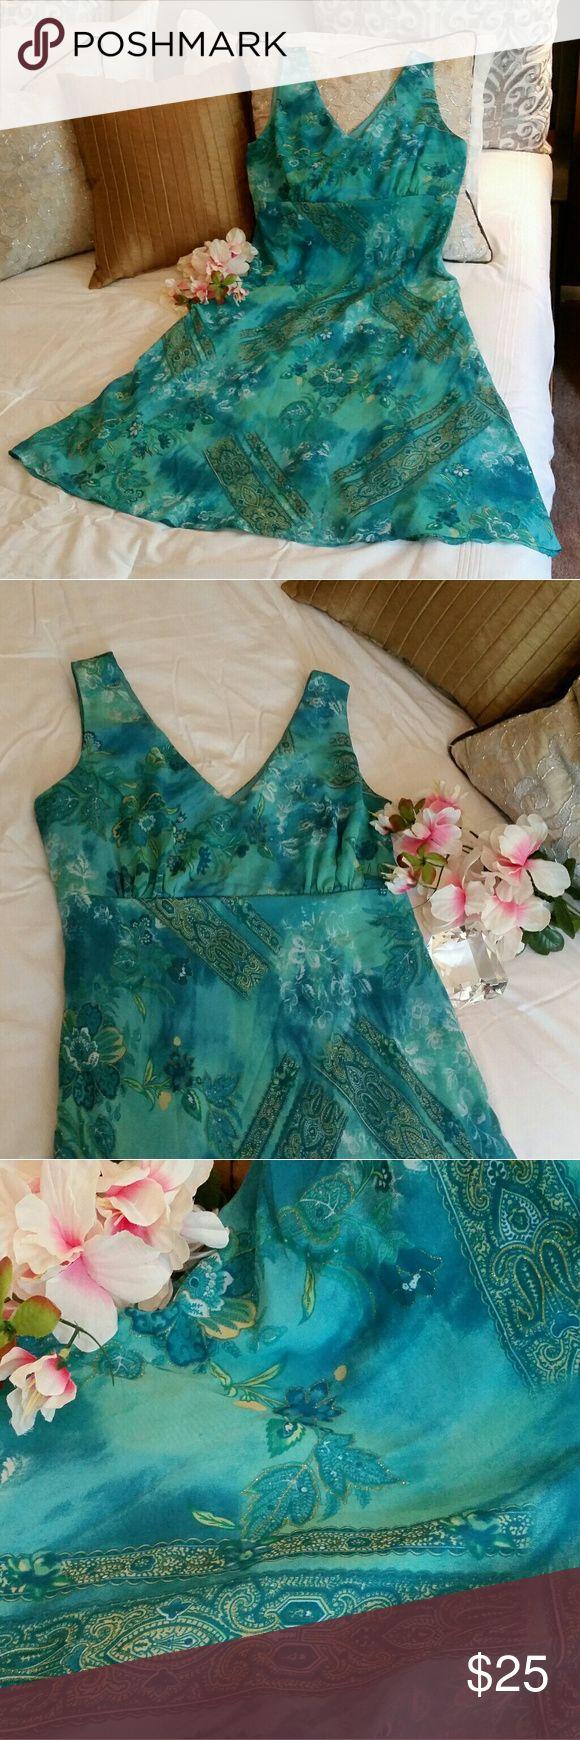 K Studio Floral Dress With Gold Sparkle Details K Studio green and blue floral dress with beautiful gold sparkle details. Like new condition. Size 12. K Studio Dresses